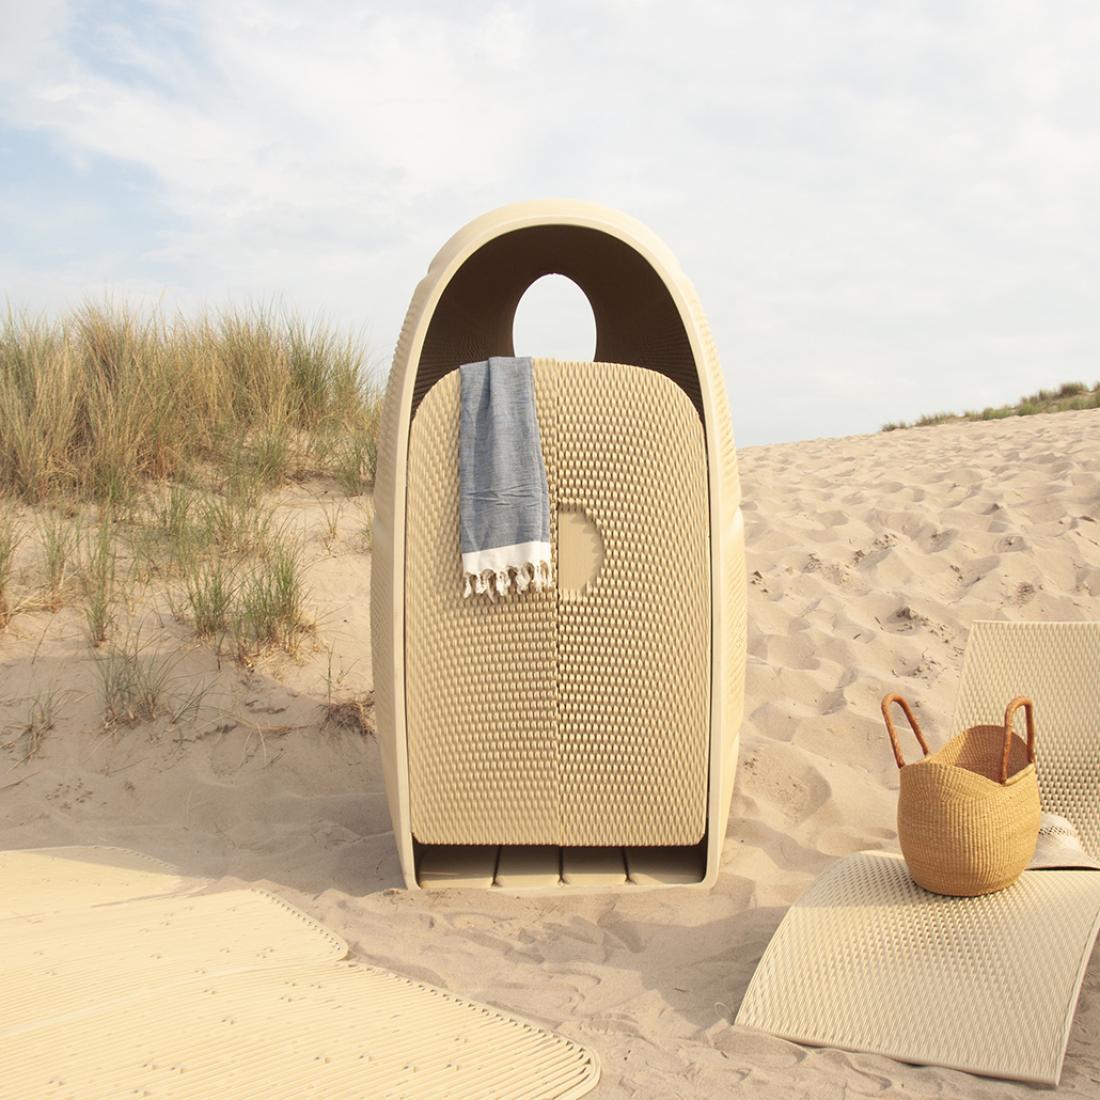 Ekologiczne meble plażowe